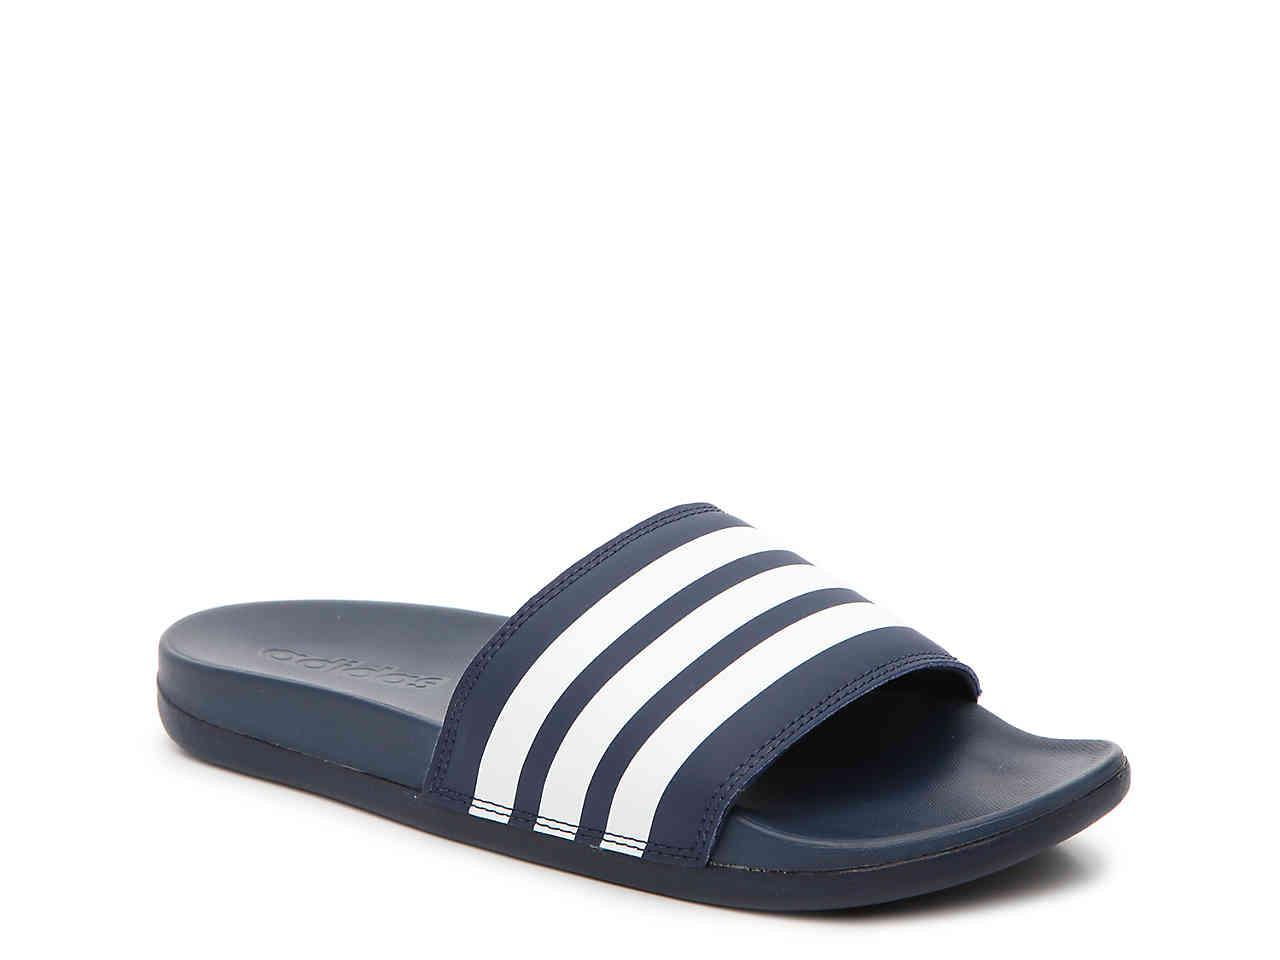 adidas adilette adilette cloudfoam ultra stripes slide sandal - womenu0027s PHXRMCE